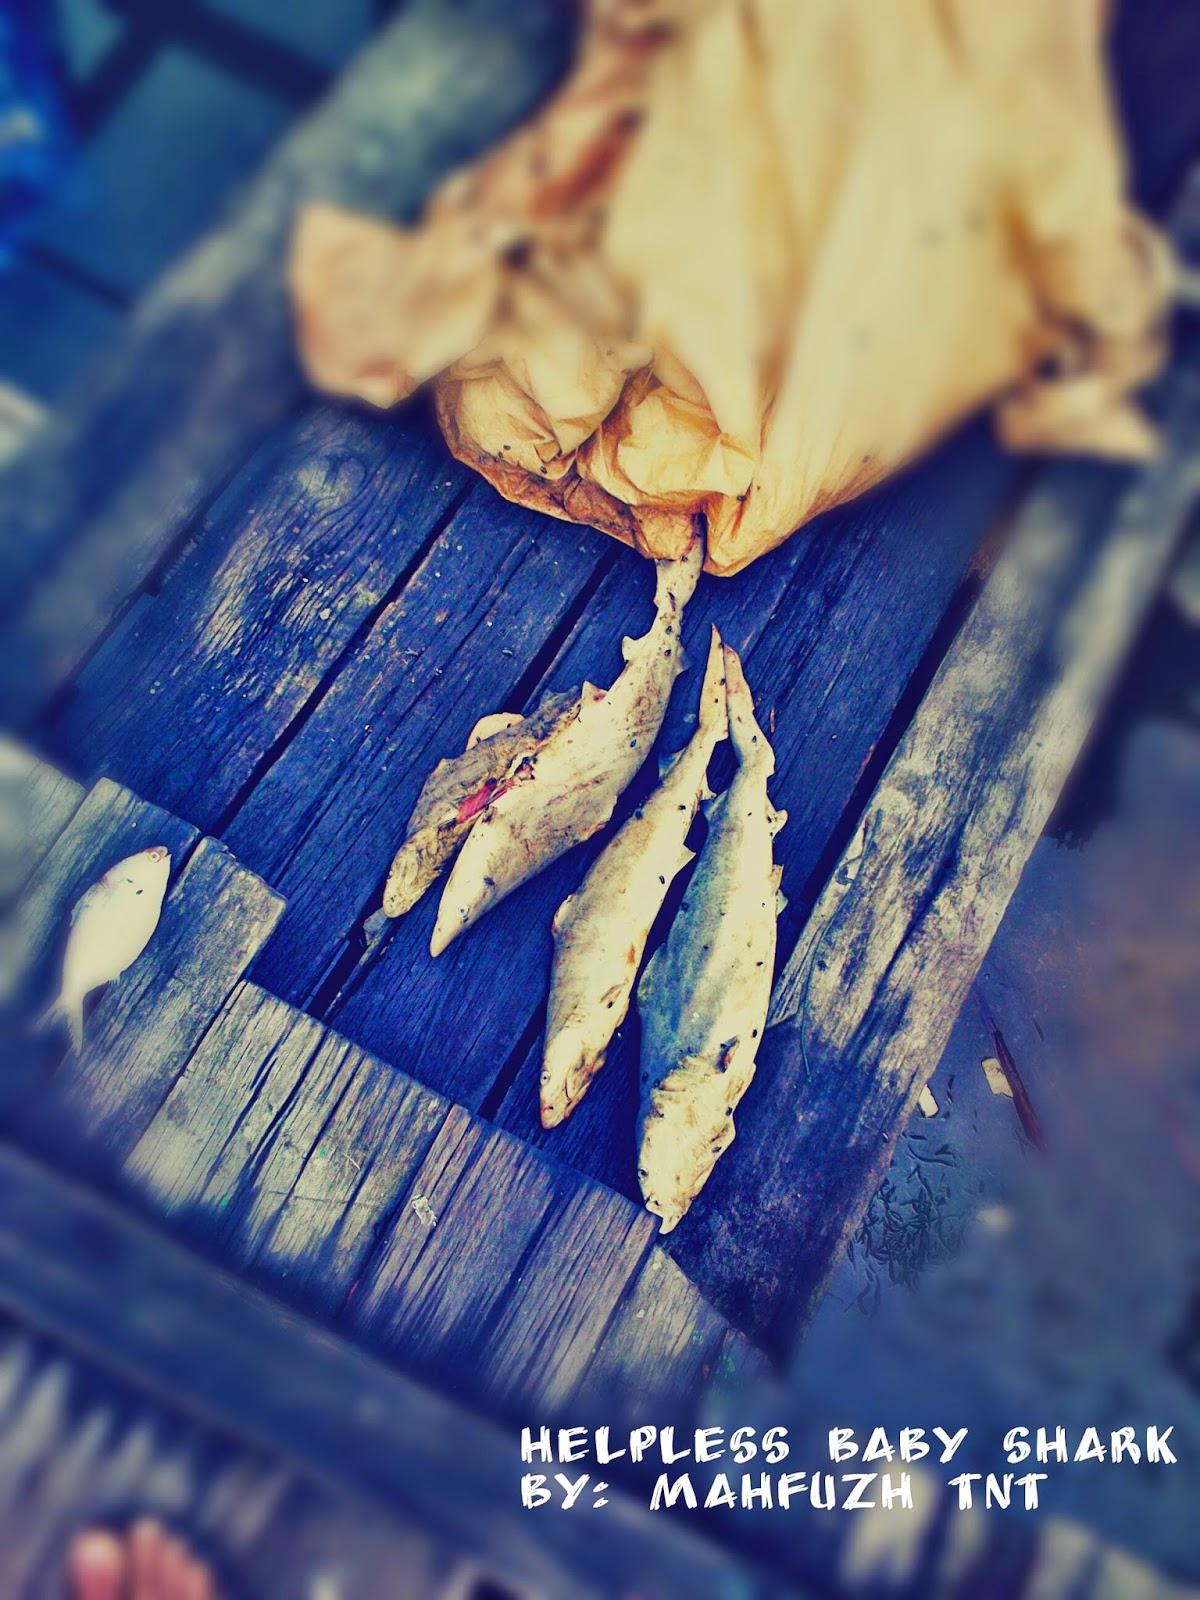 killed baby shark in borneo